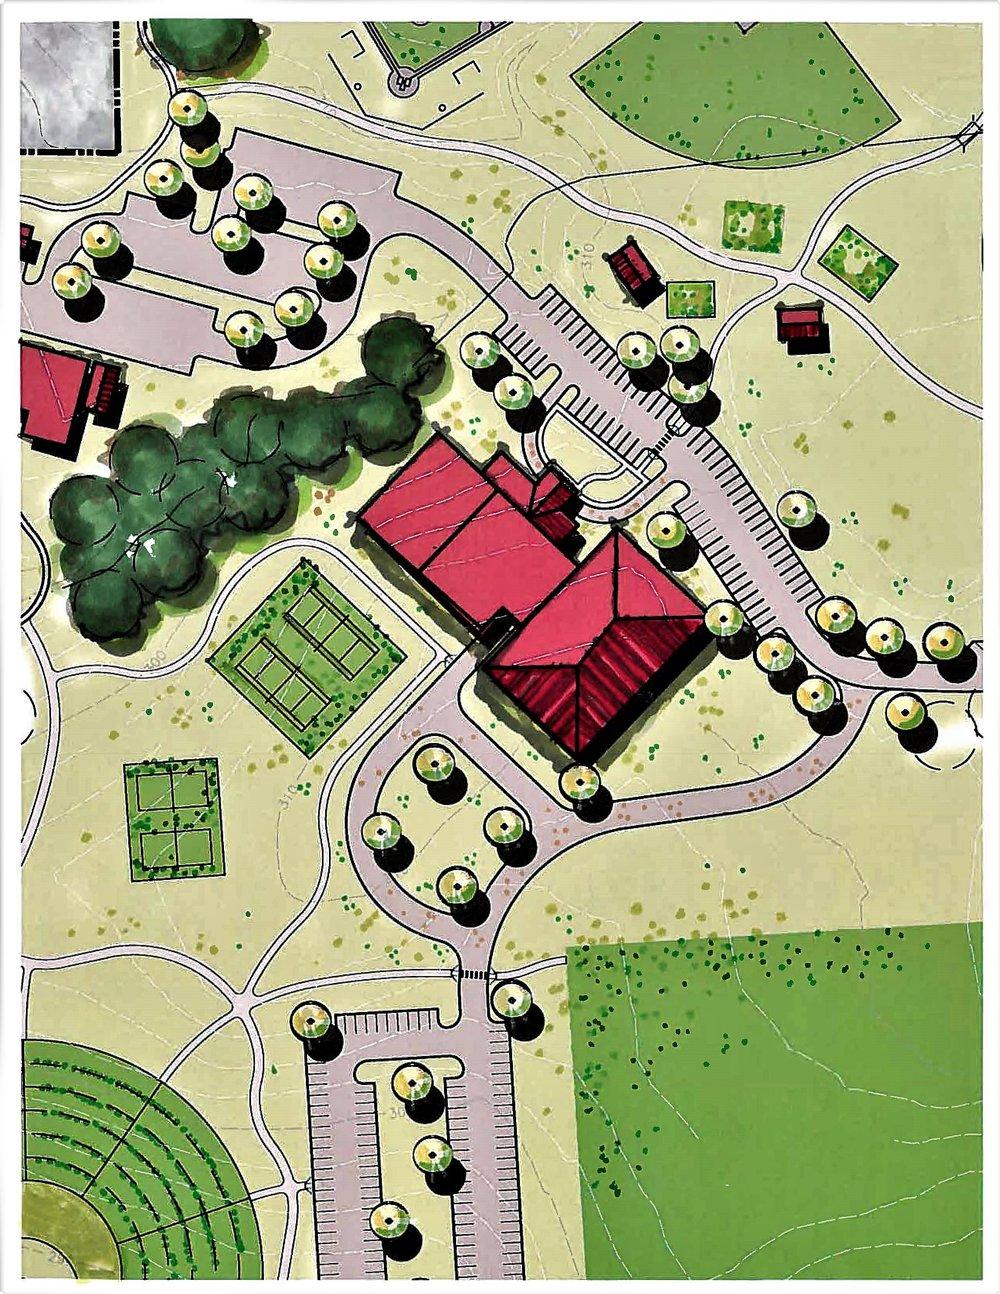 Wendell 3rd Street Park - Landscape Architecture